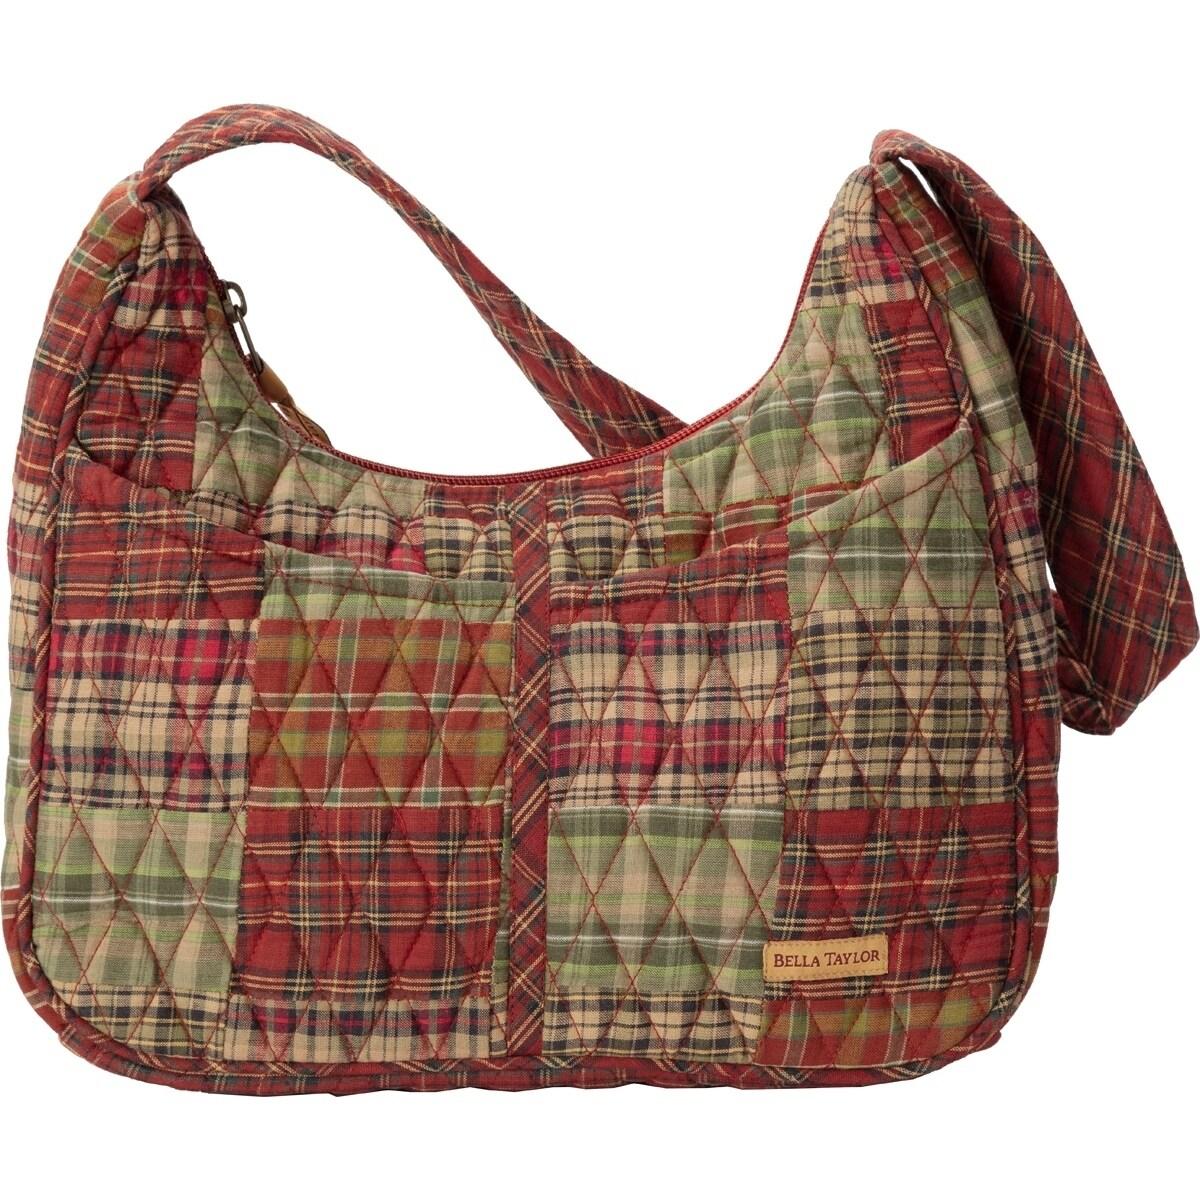 Vhc Gatlinburg Barn Red Bella Taylor Handbags Plaid Blakely Free Shipping On Orders Over 45 22889784